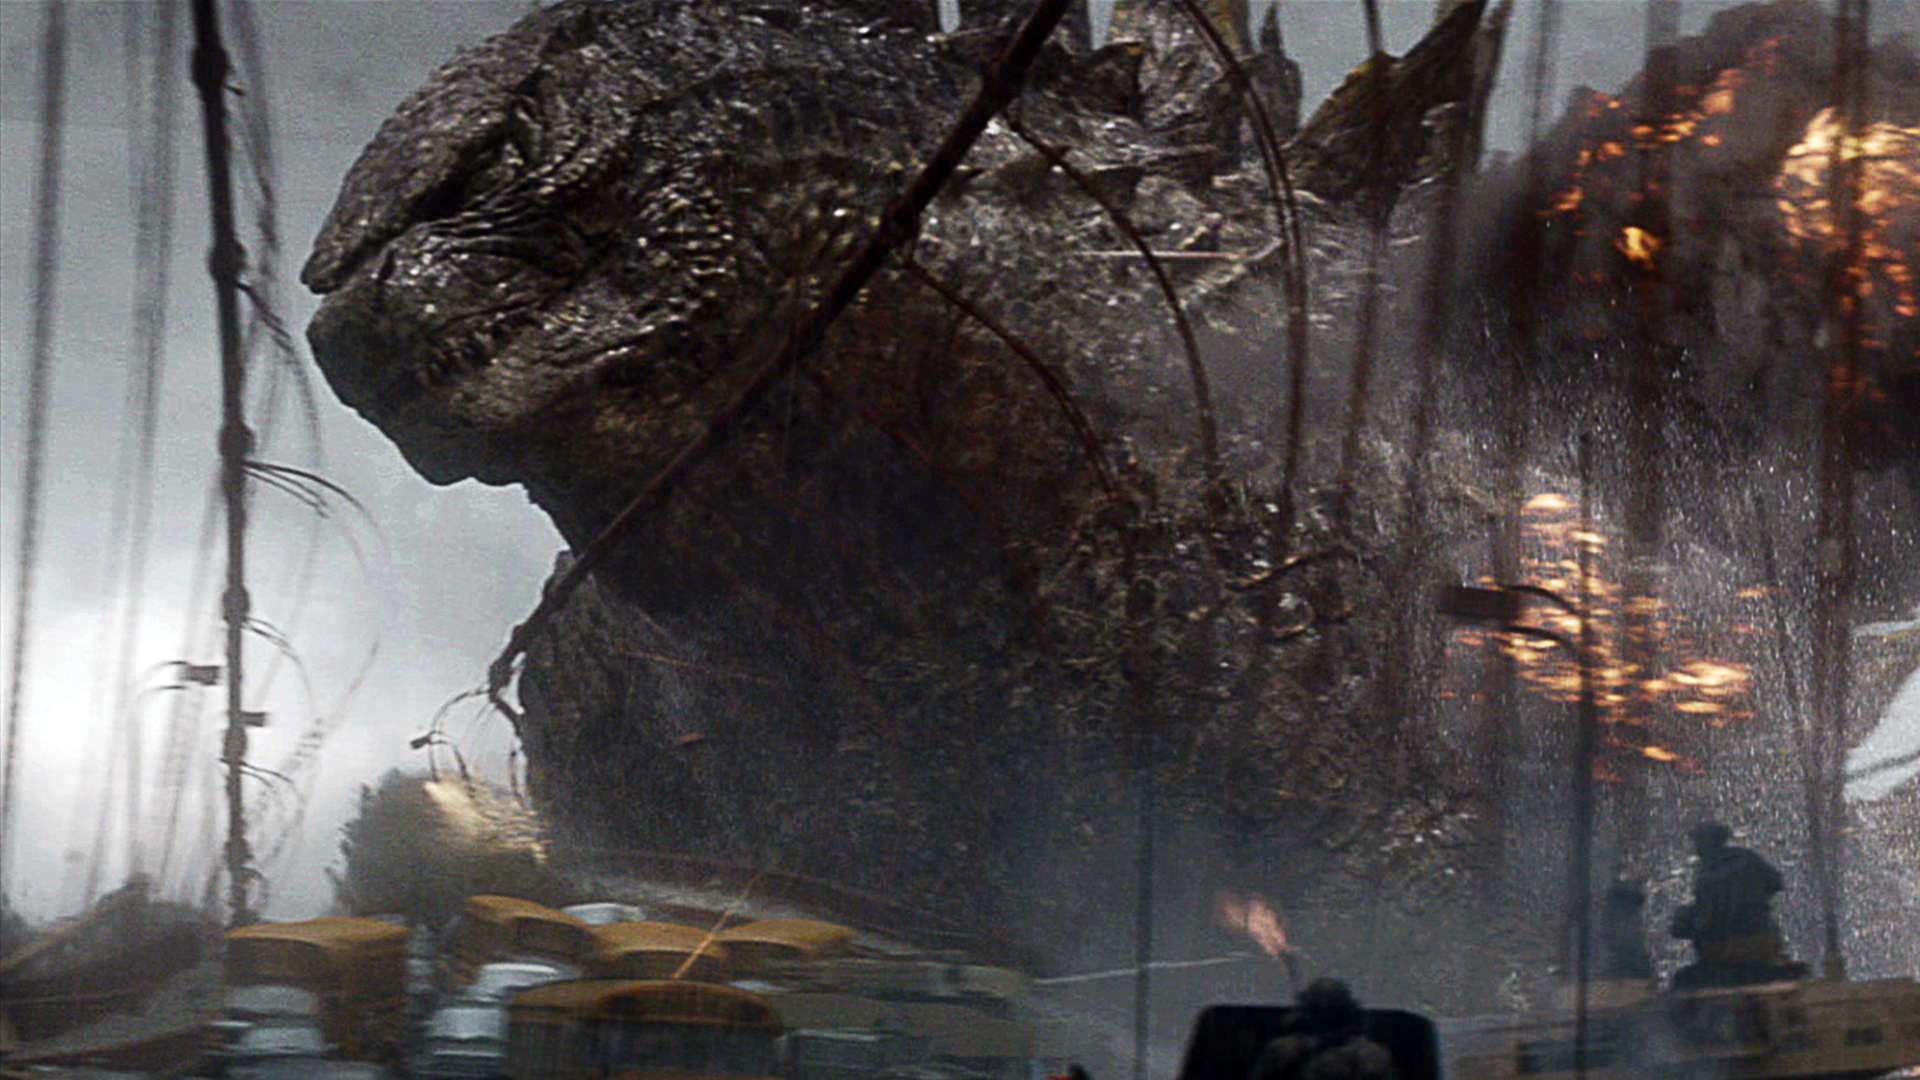 Godzilla 2014 Wallpaper Background Deskto 3496 Wallpaper Cool 1920x1080